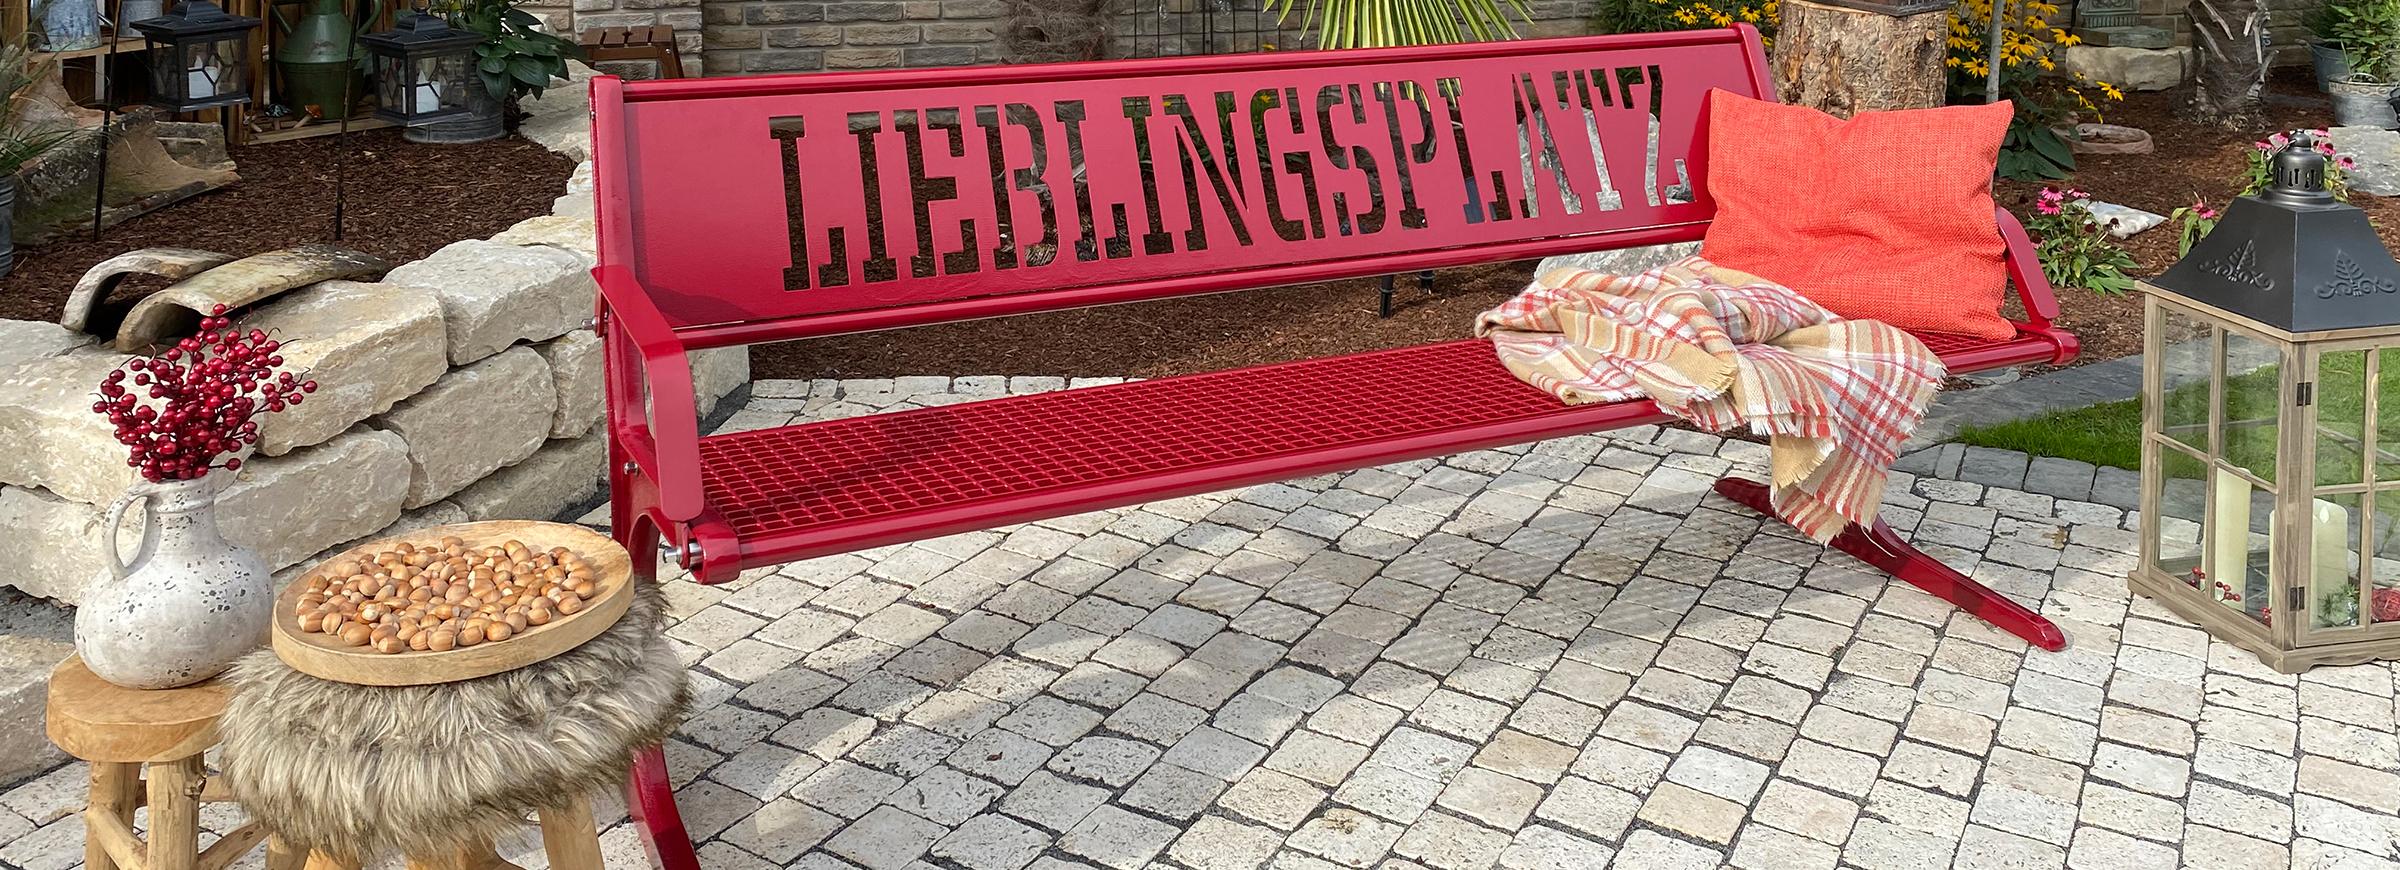 hygrocare_Lieblingsplatz-Classic-P602-Purpurrot-E3004-2400x870px